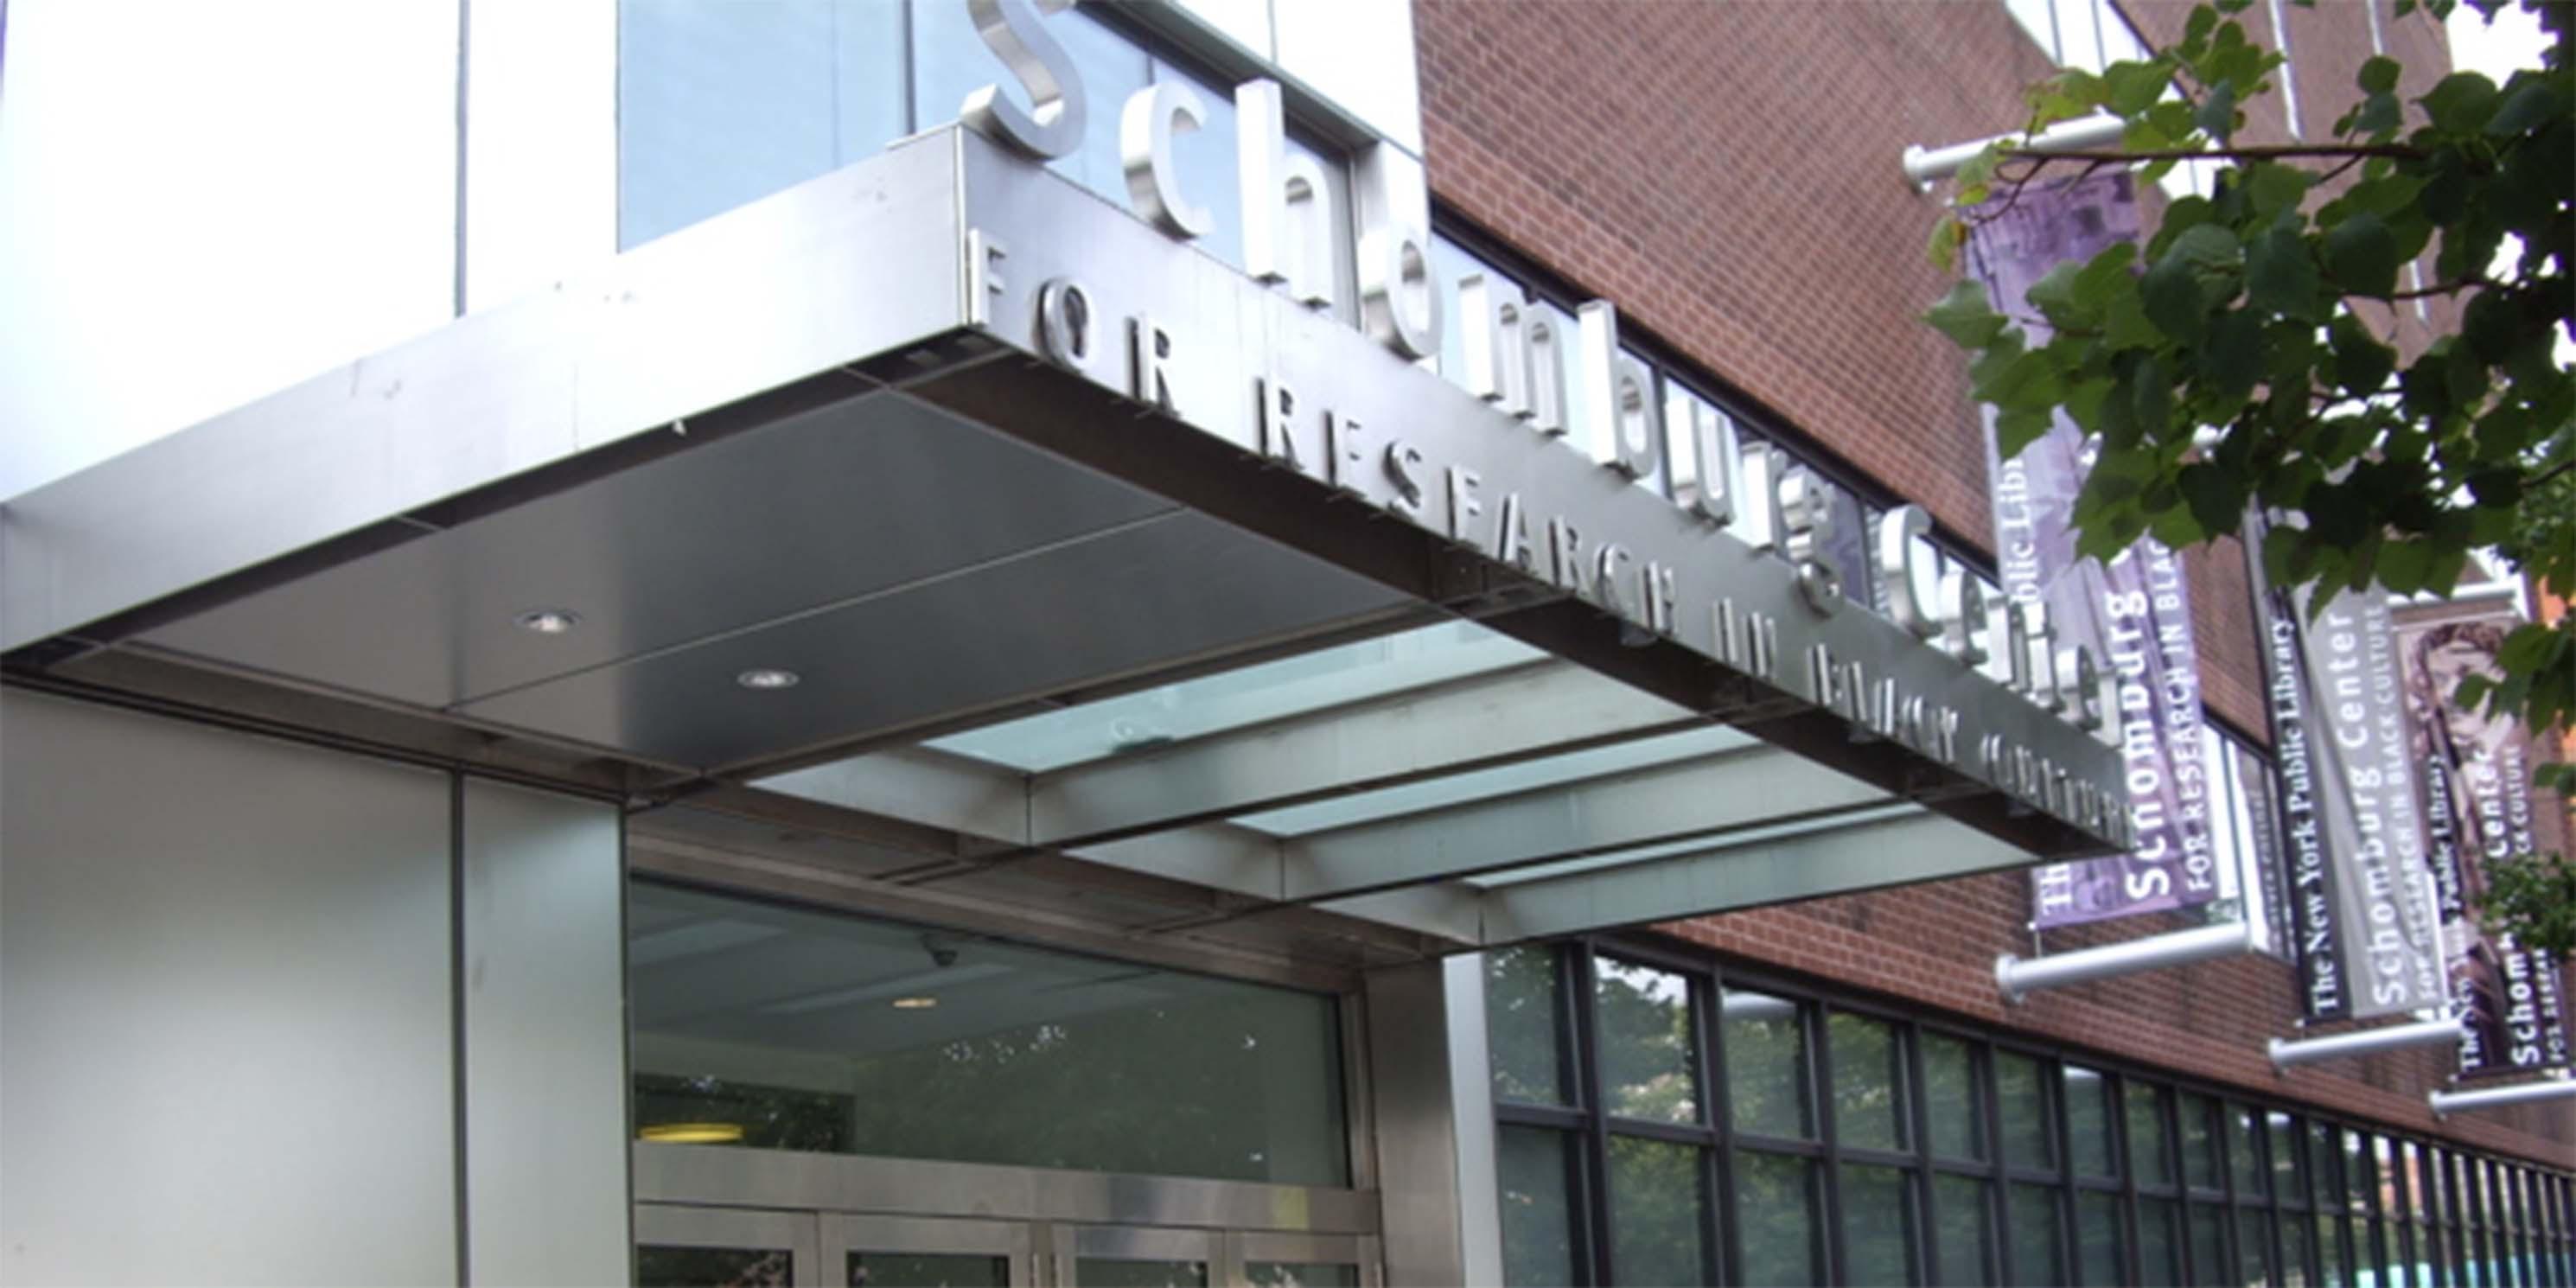 entrance to the Shomburg Center in Harlem